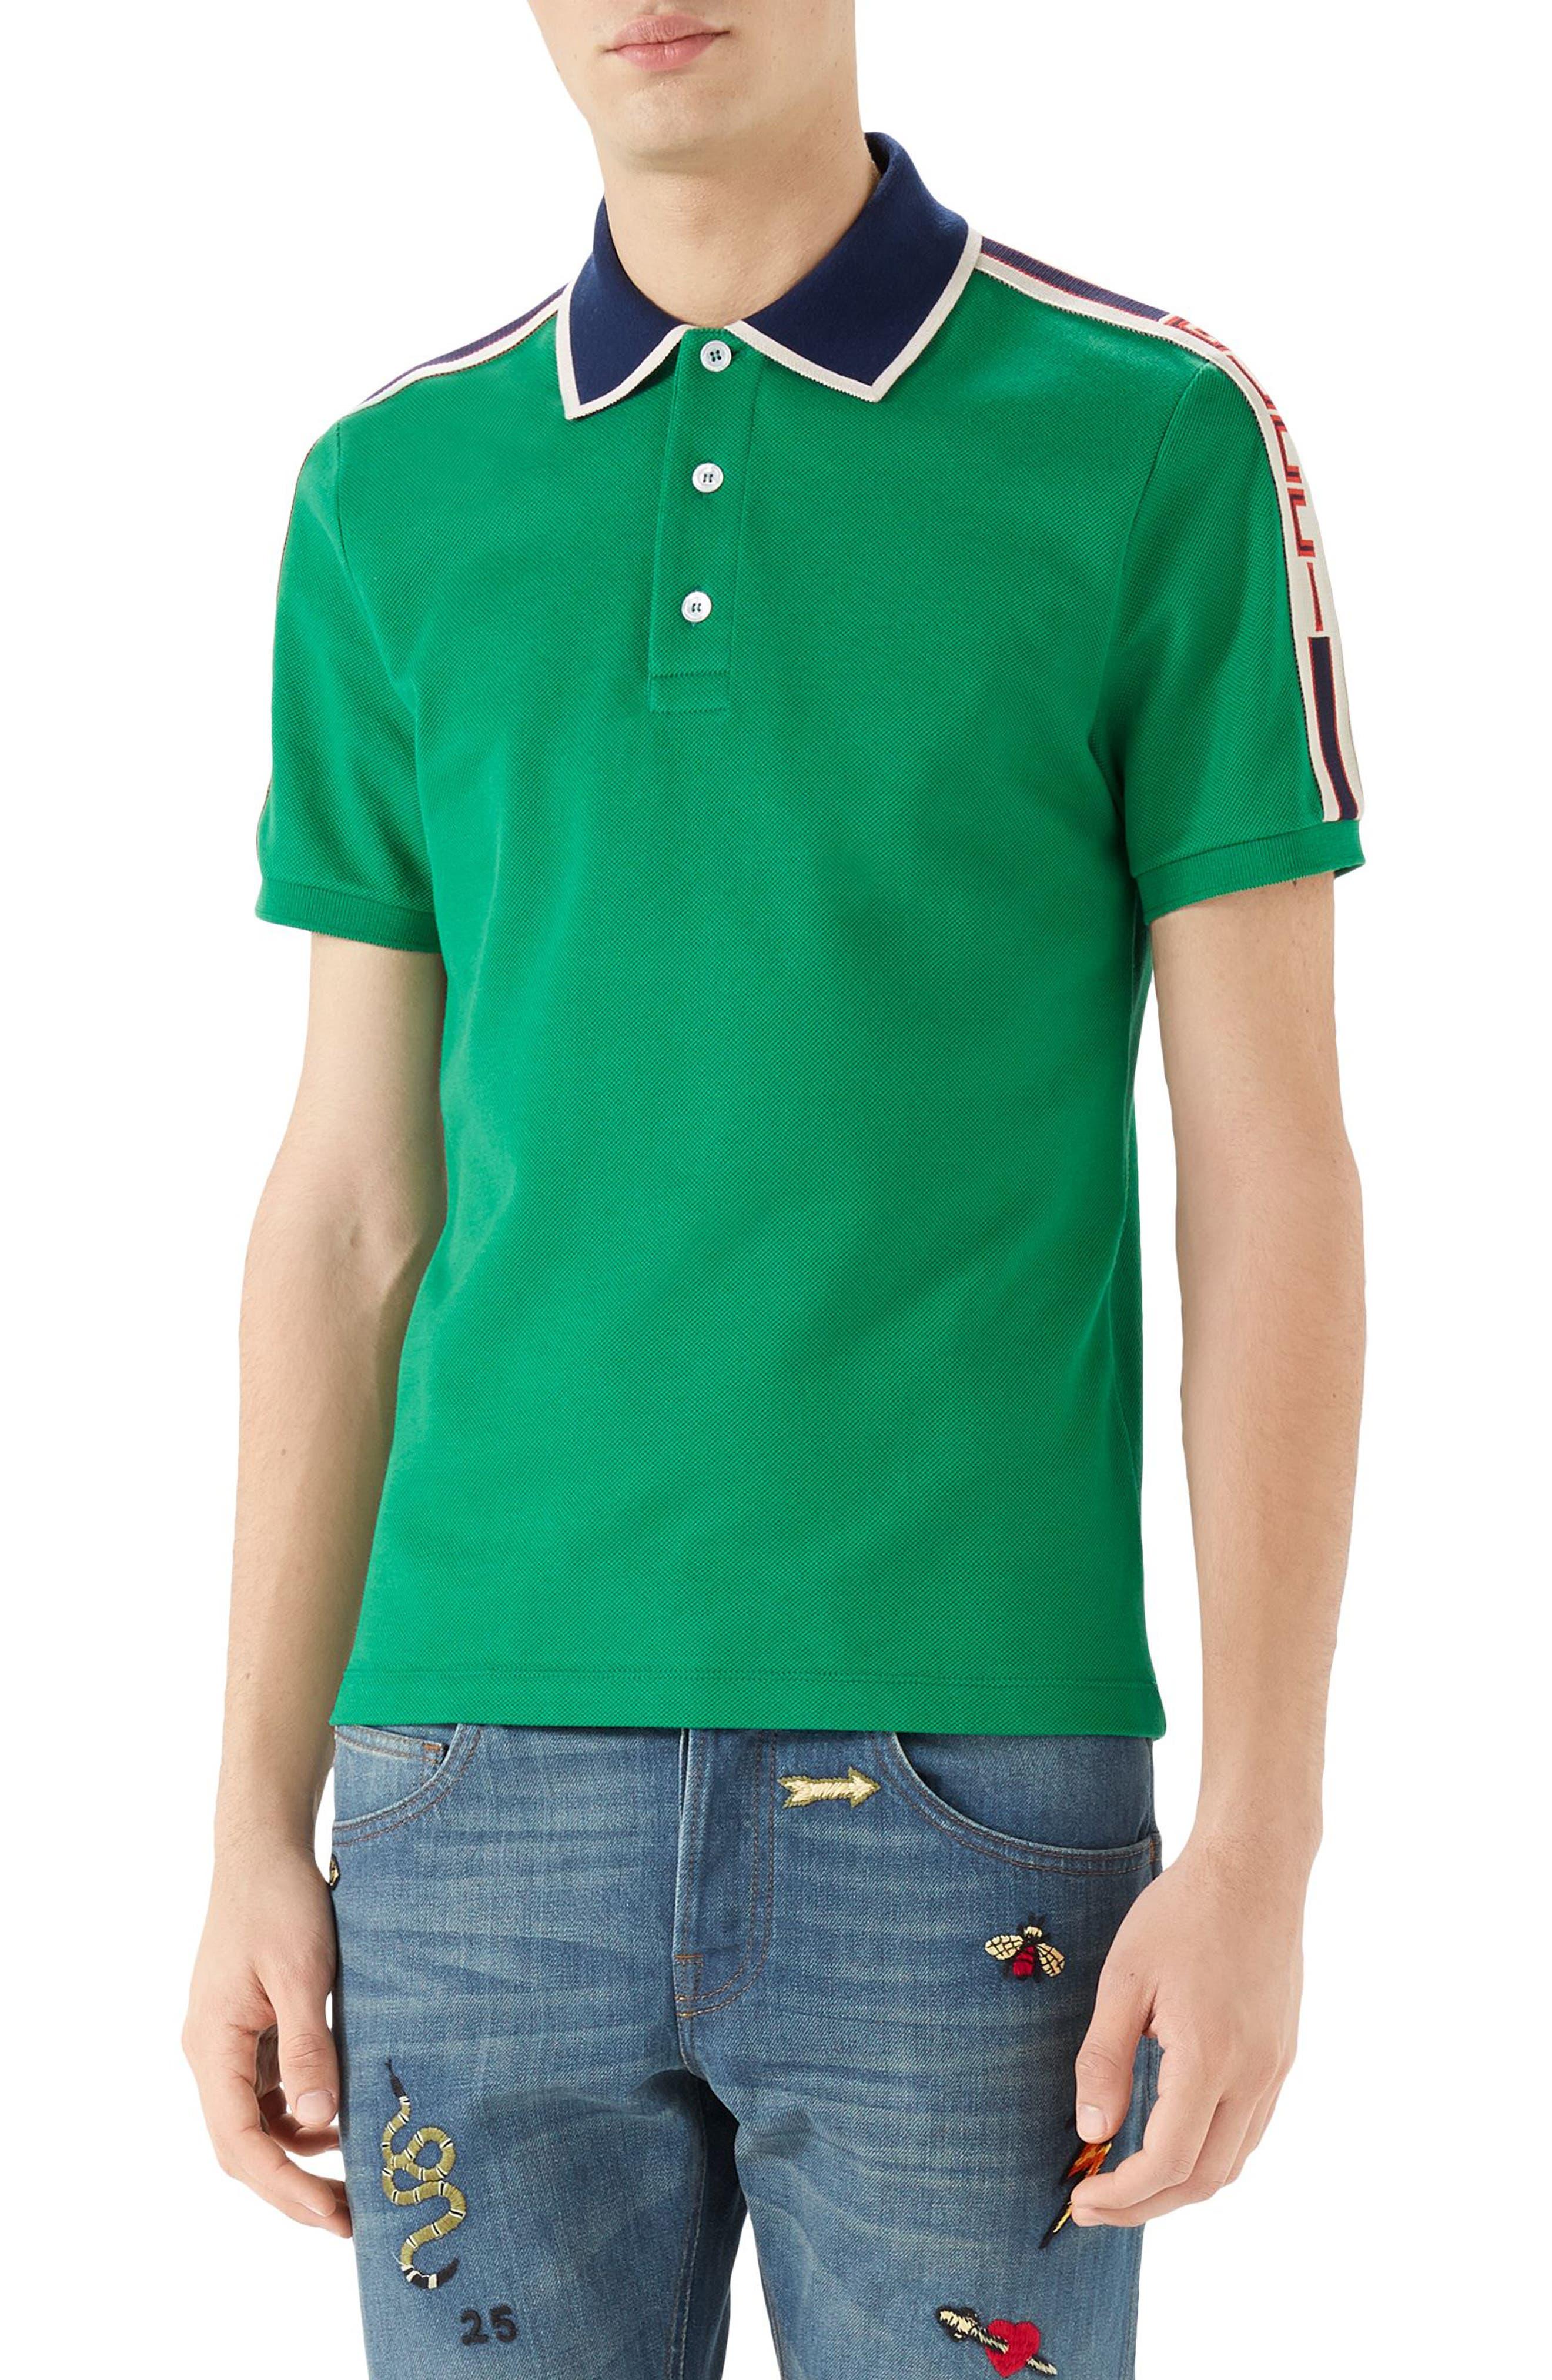 Gucci Jacquard Stripe Sleeve Piqué Polo